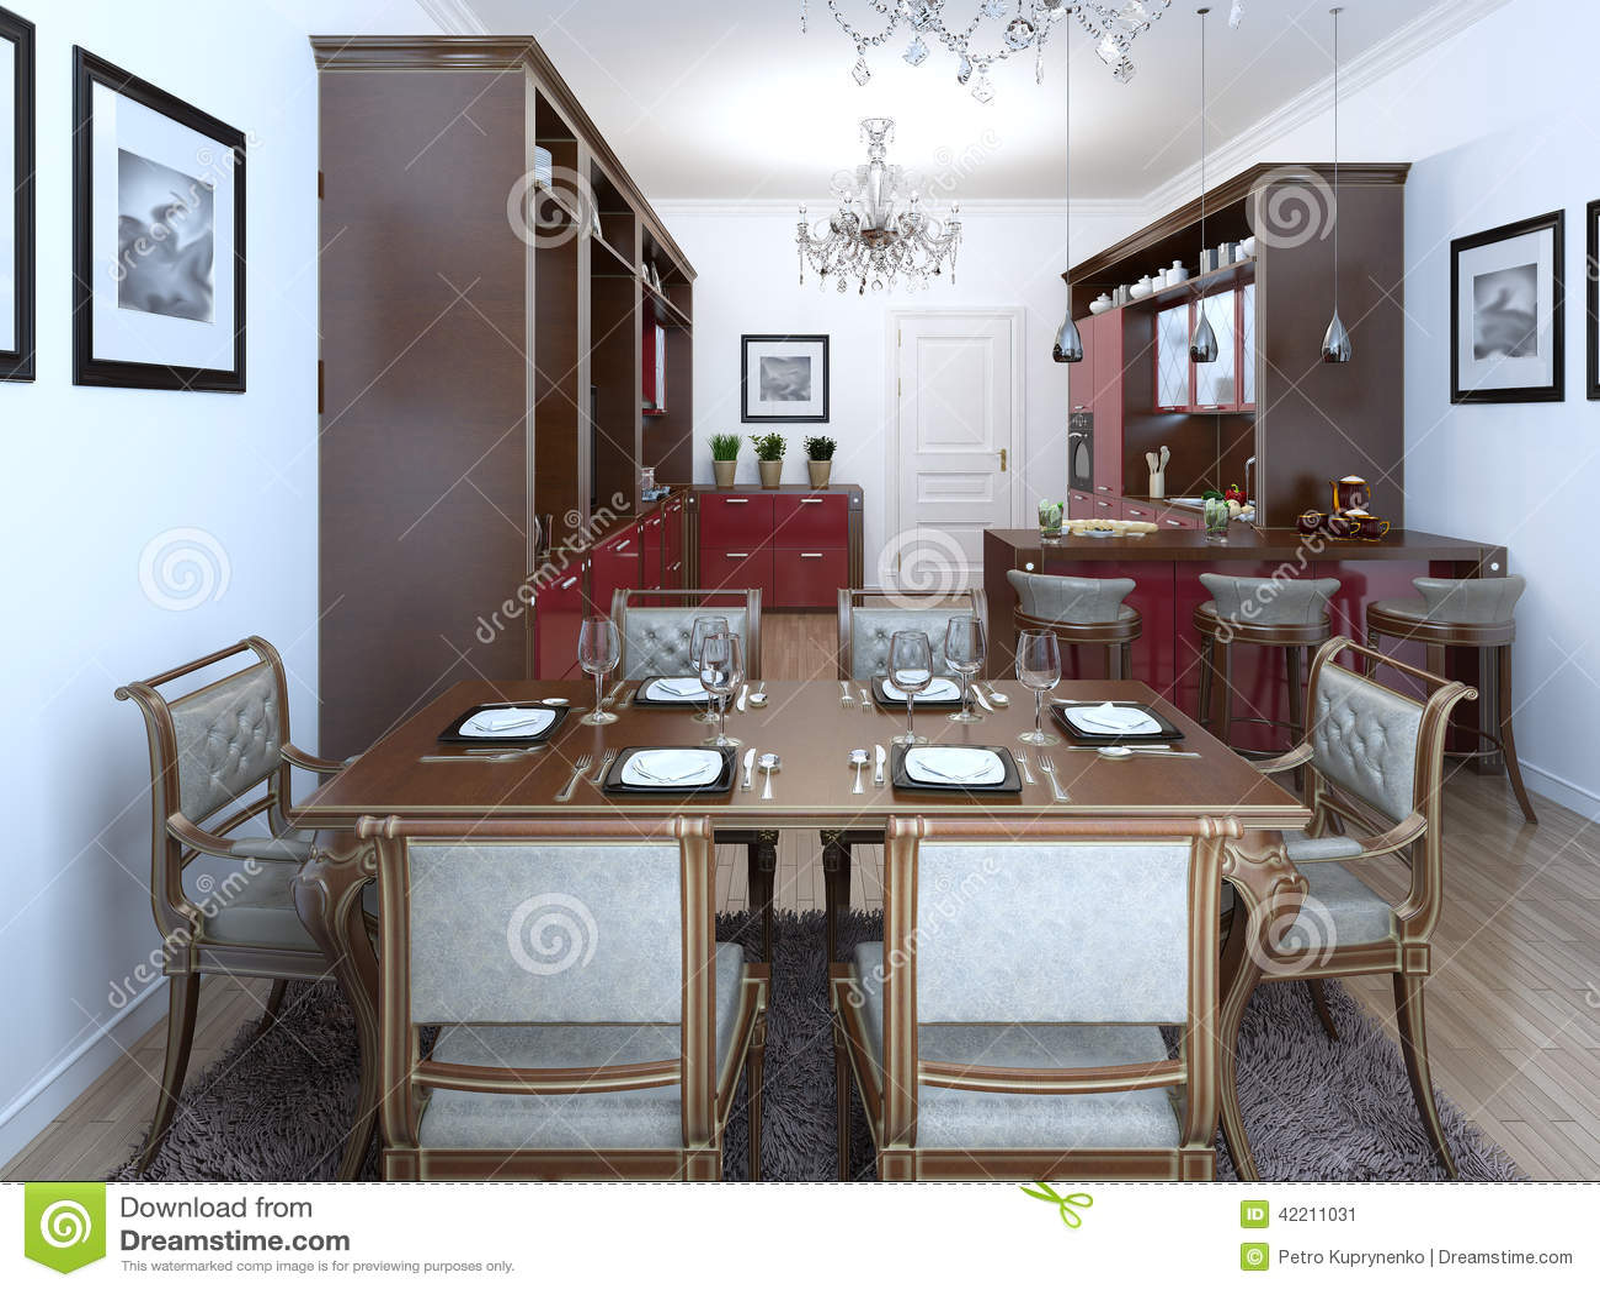 cuisine dans le style d 39 art deco illustration stock illustration du confortable famille 42211031. Black Bedroom Furniture Sets. Home Design Ideas